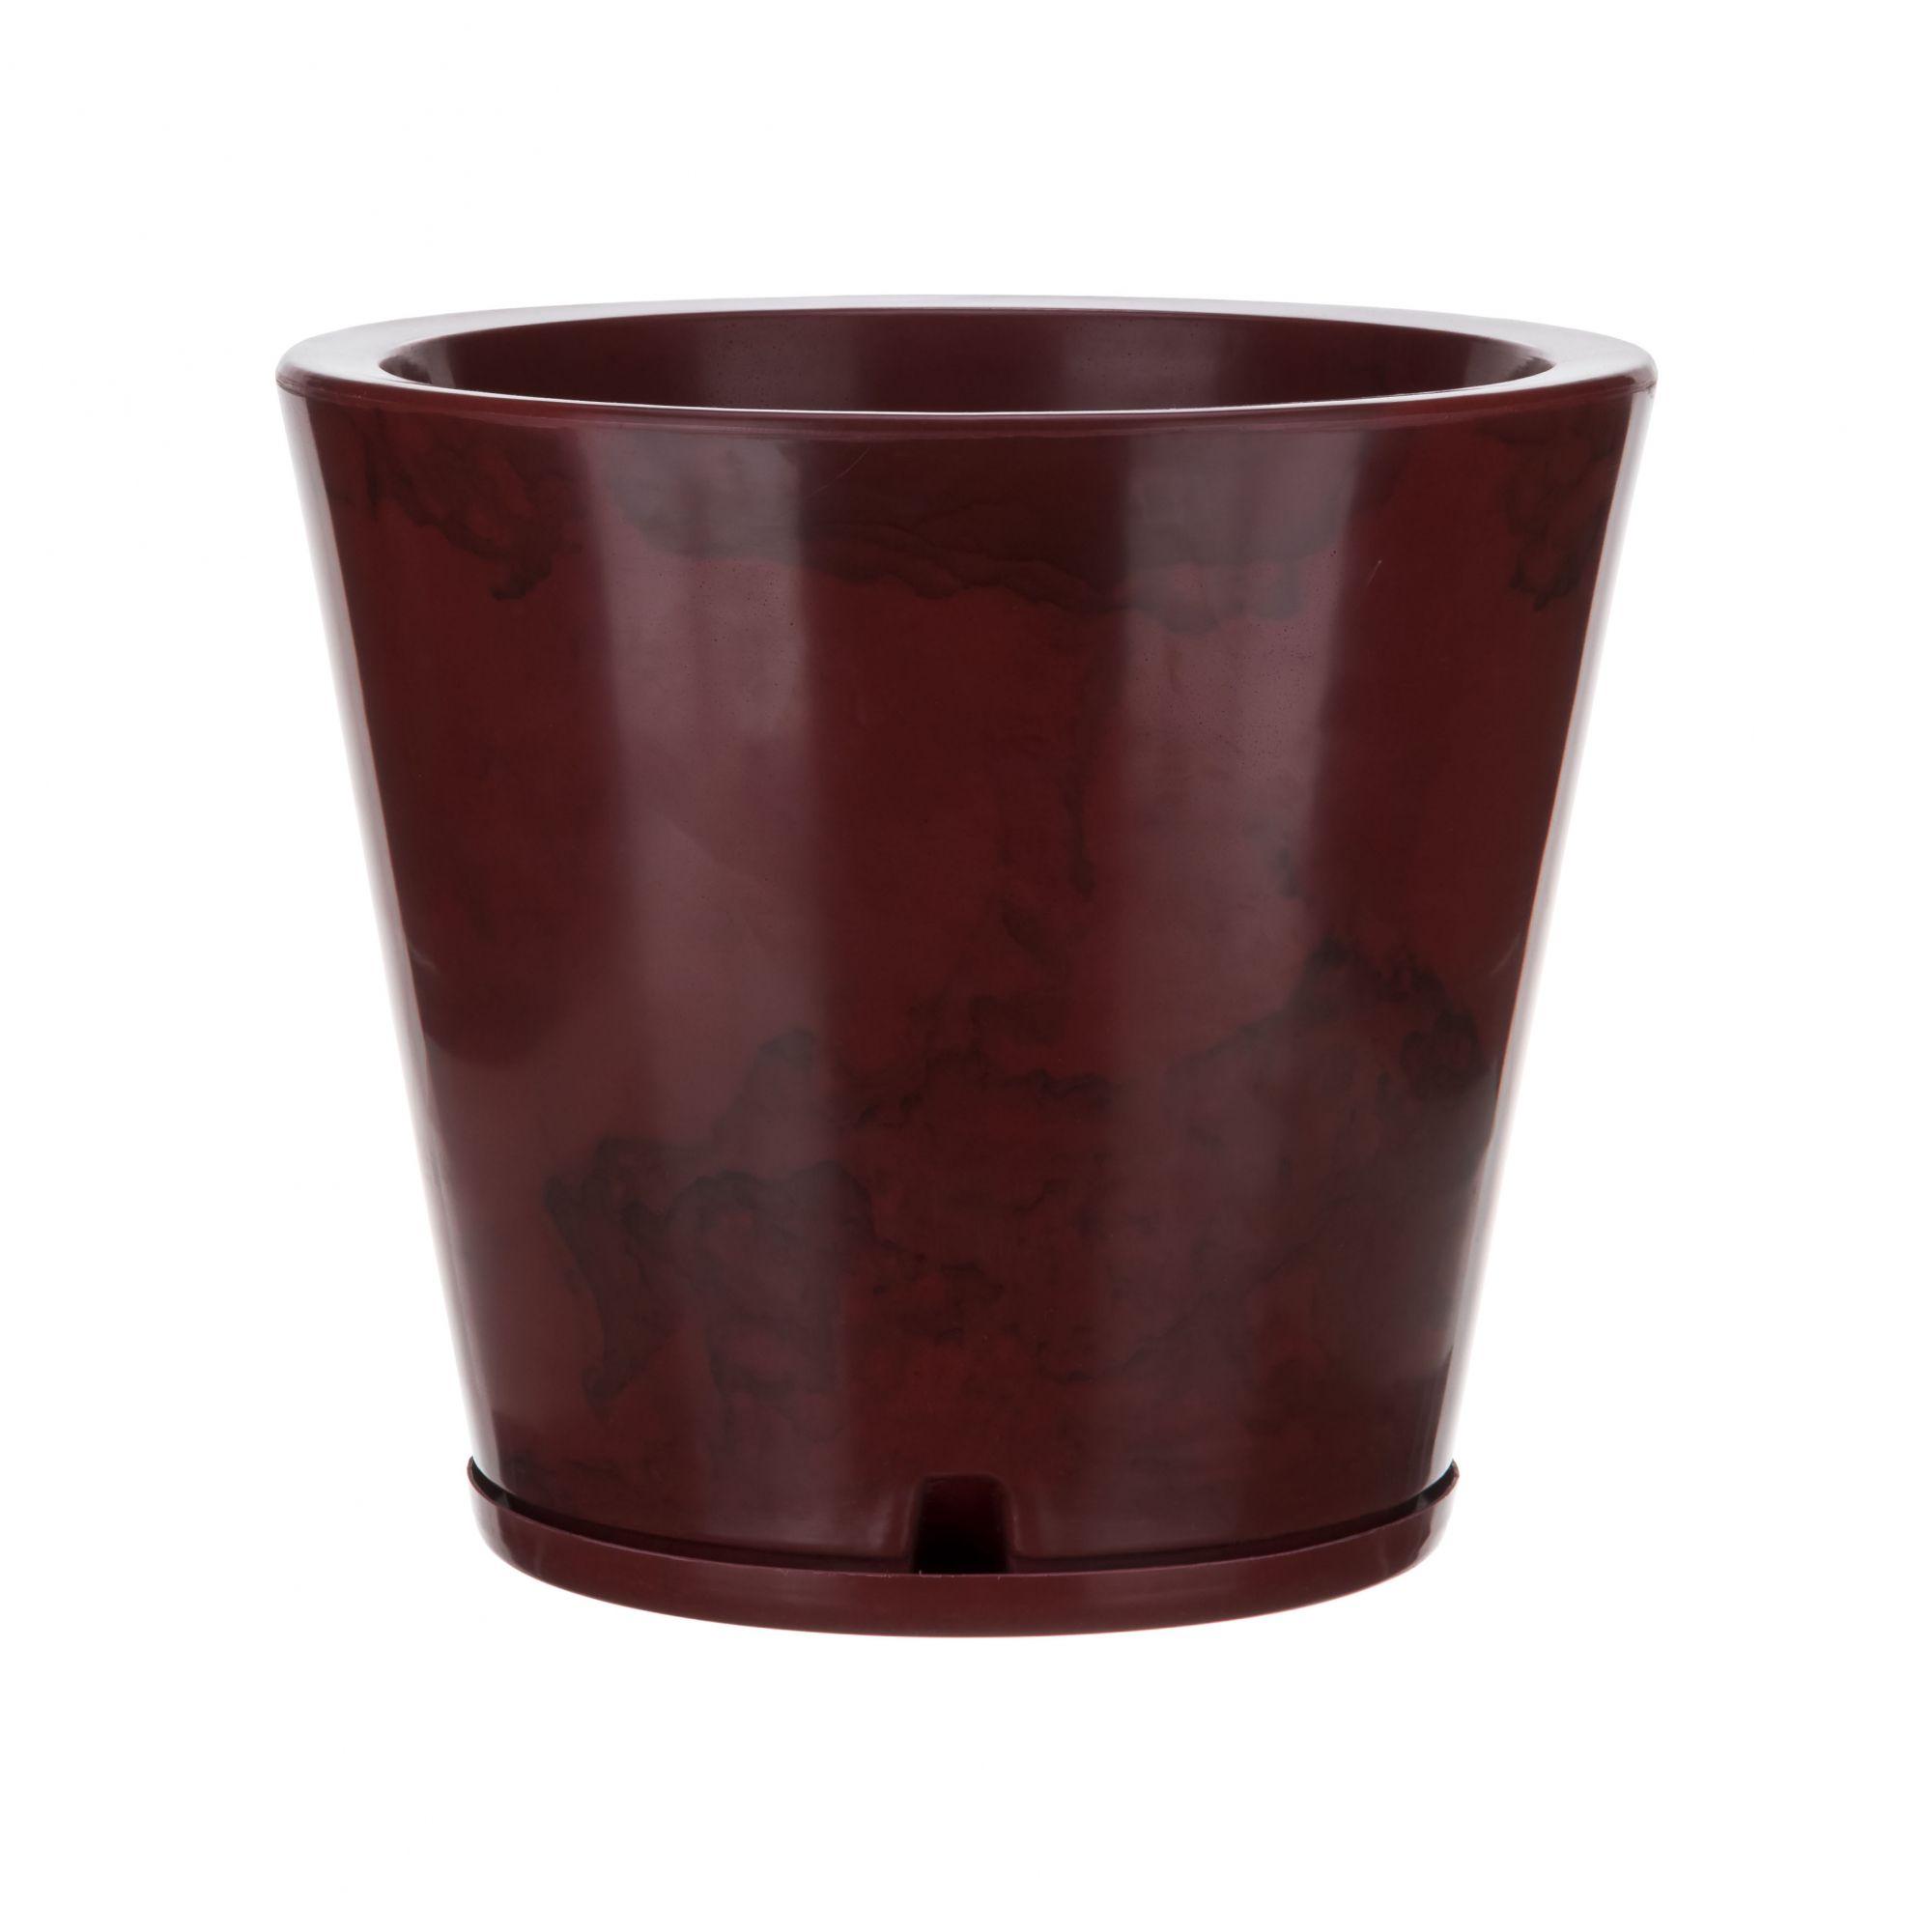 Vaso Genebra Marmorato Vermelho - 34 x 35 cm